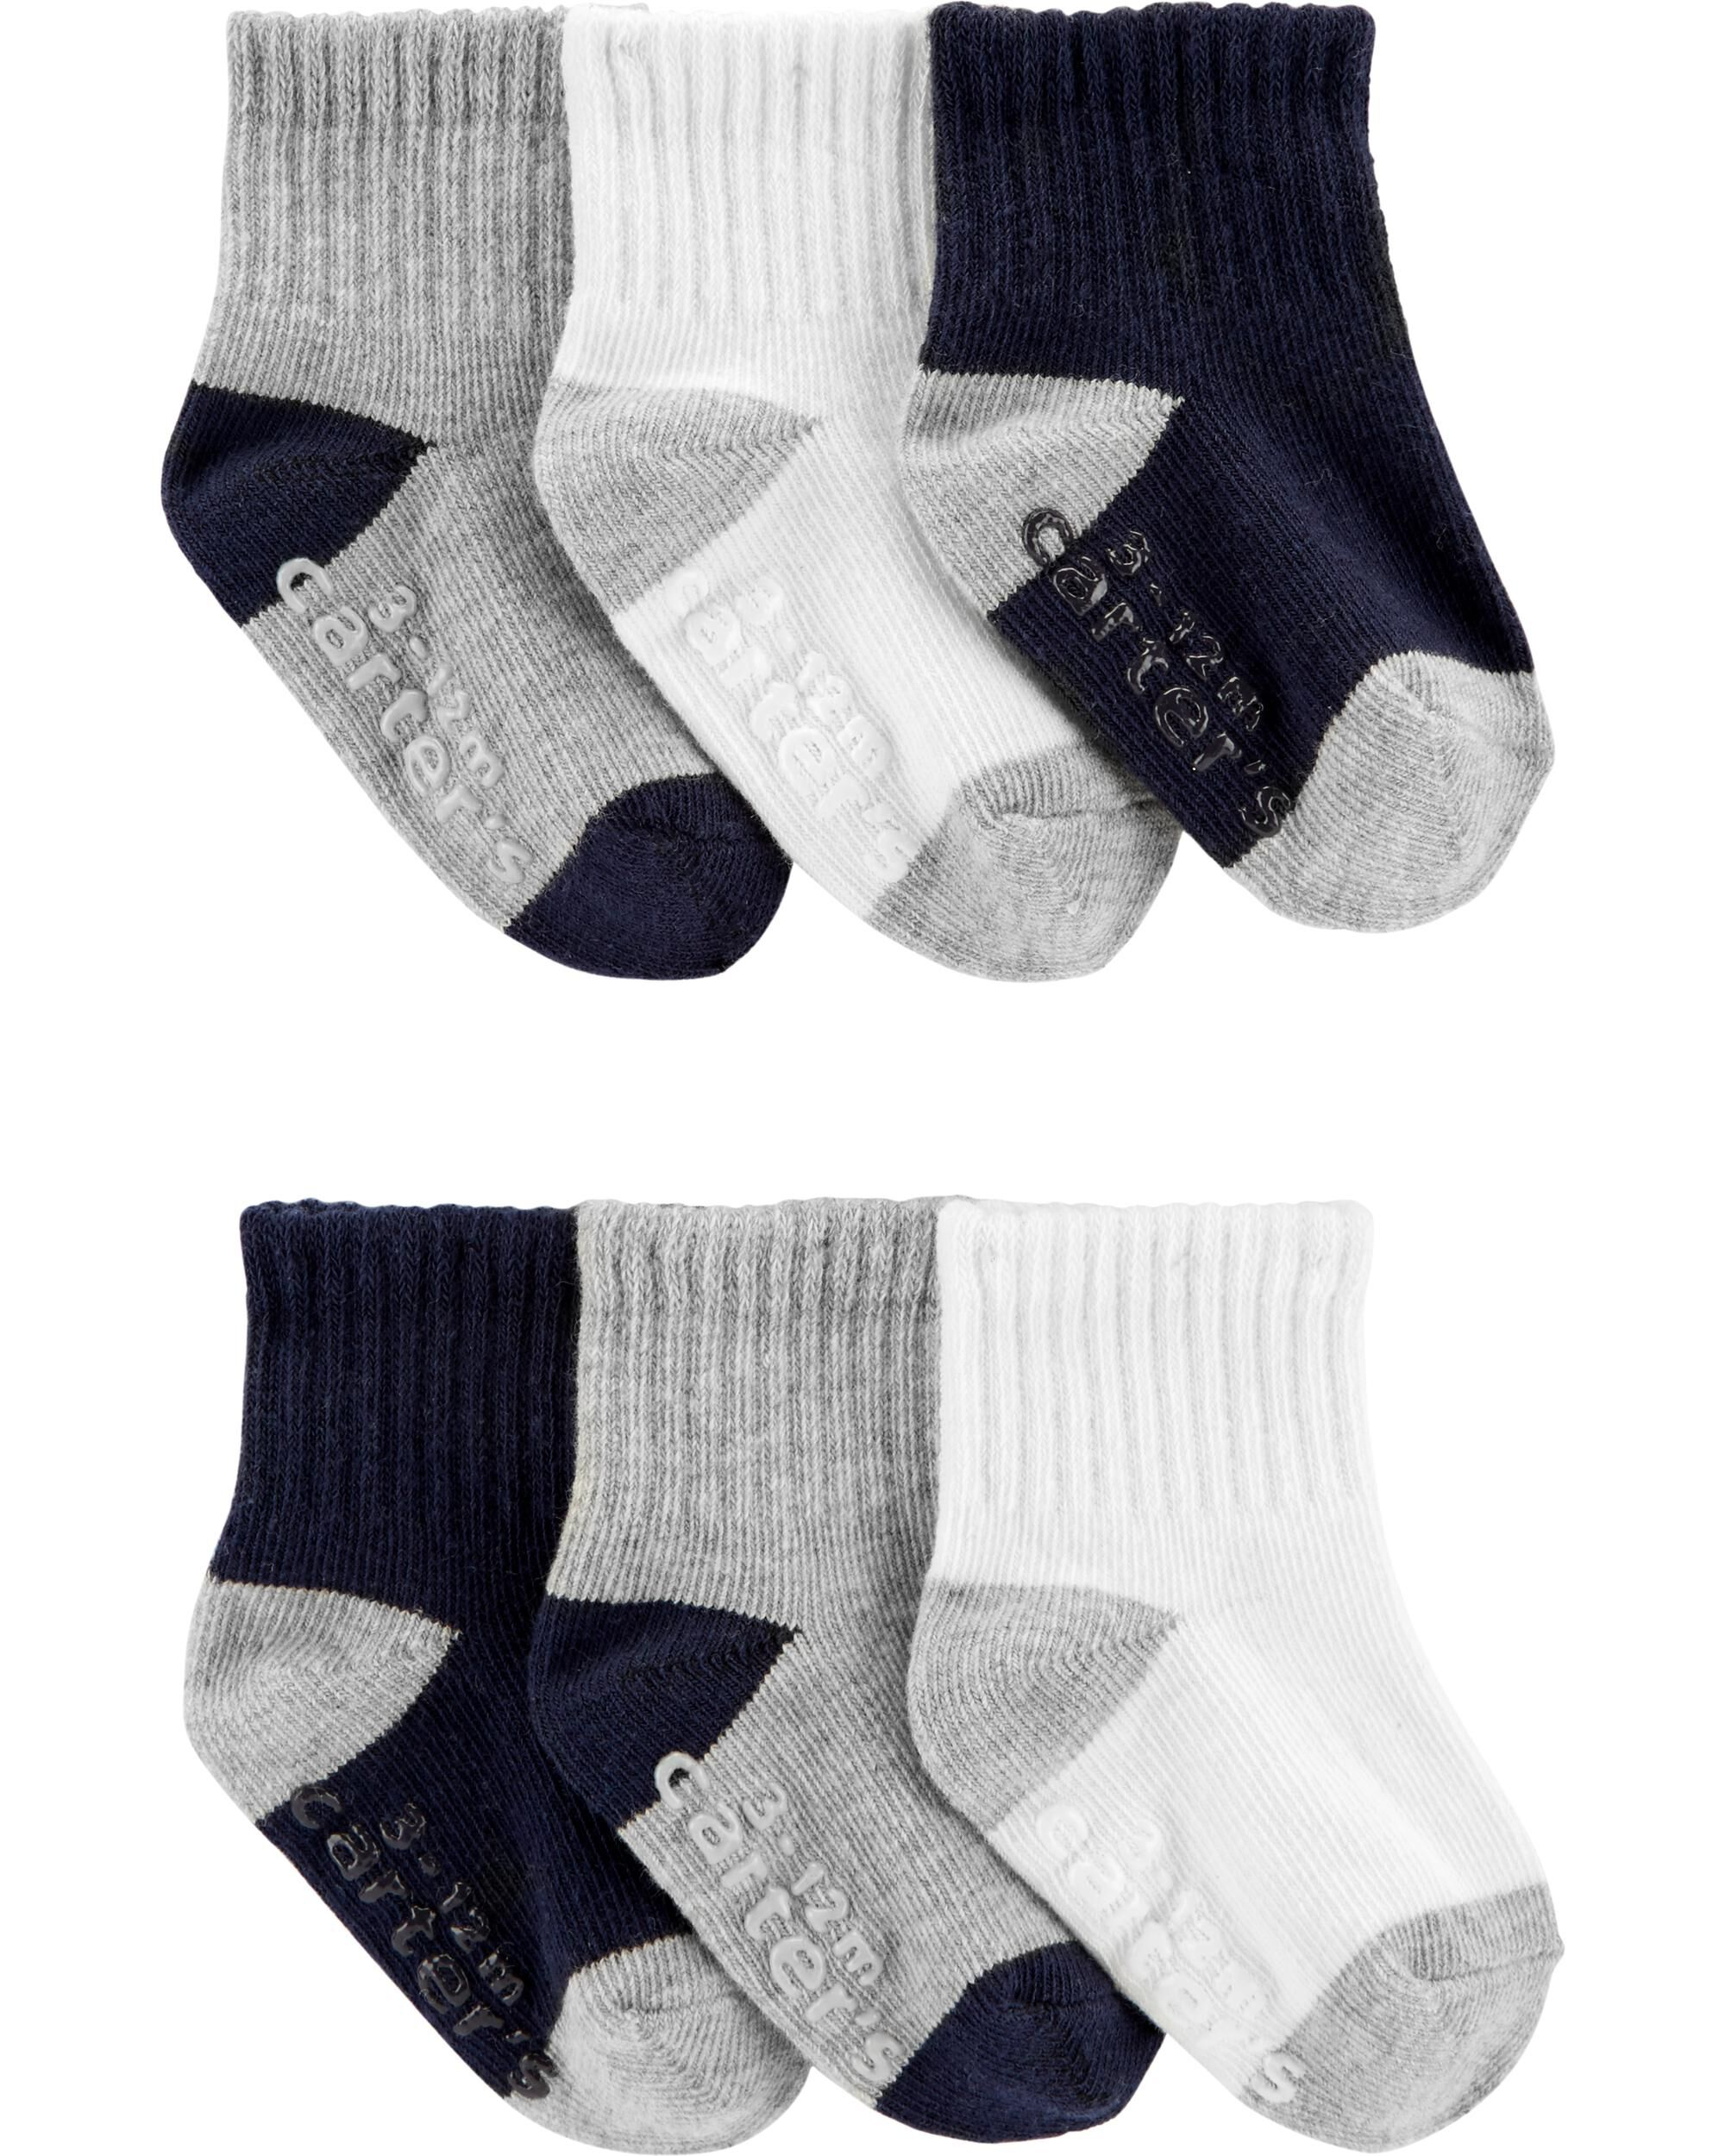 Ladies Chunky Boot Socks Wool Blend Socks thick Heavy Work wholesale clearance